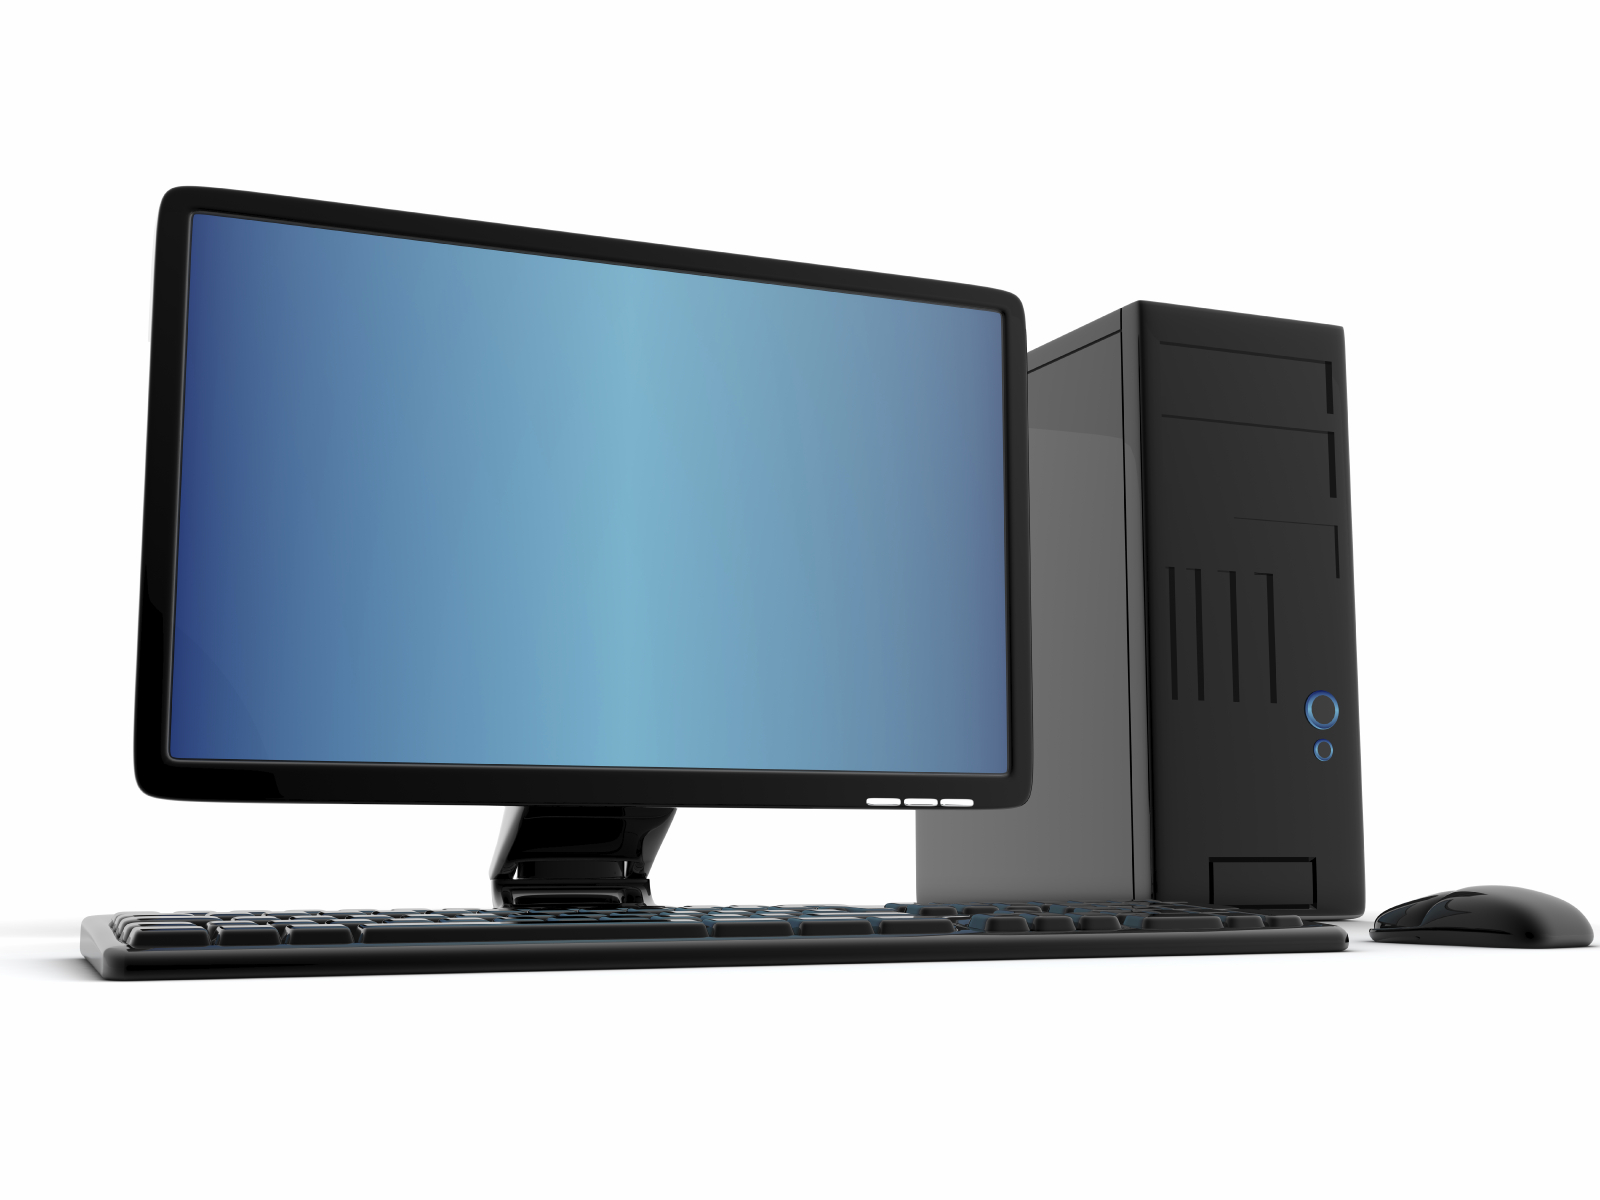 1600x1200 Computers Information Engineering360